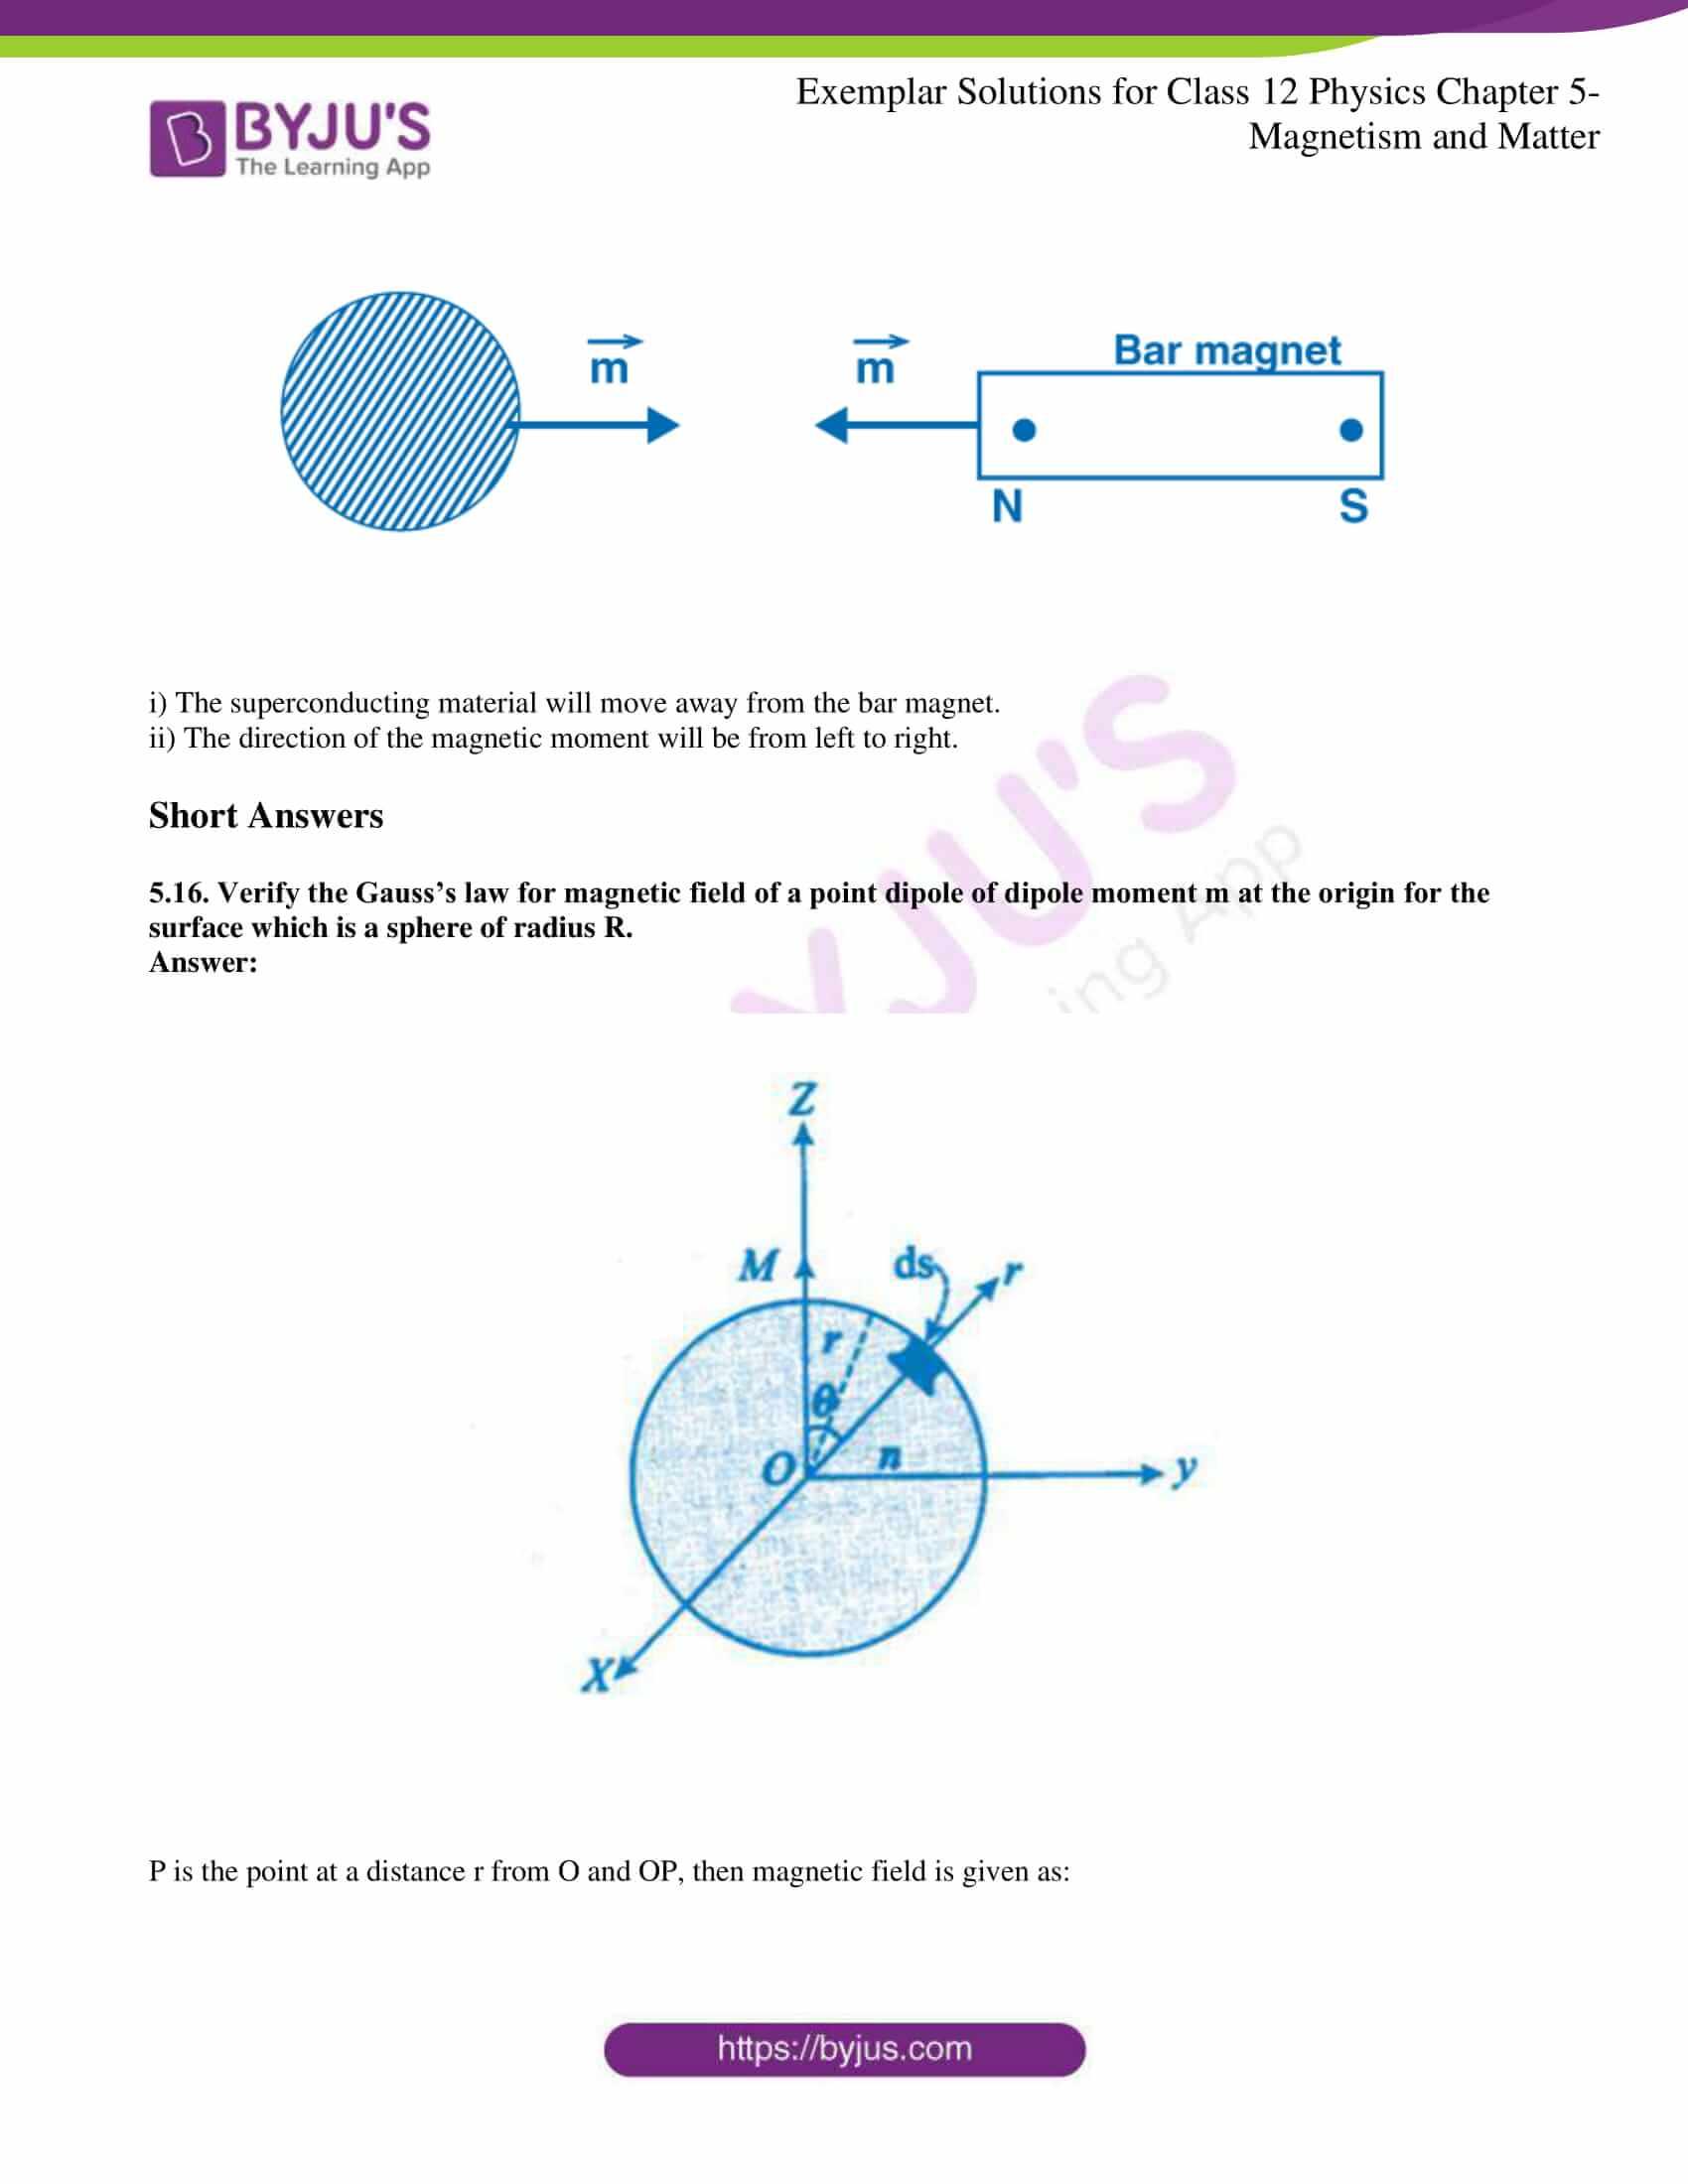 ncert exemplar solutions for class 12 physics chapter 5 04